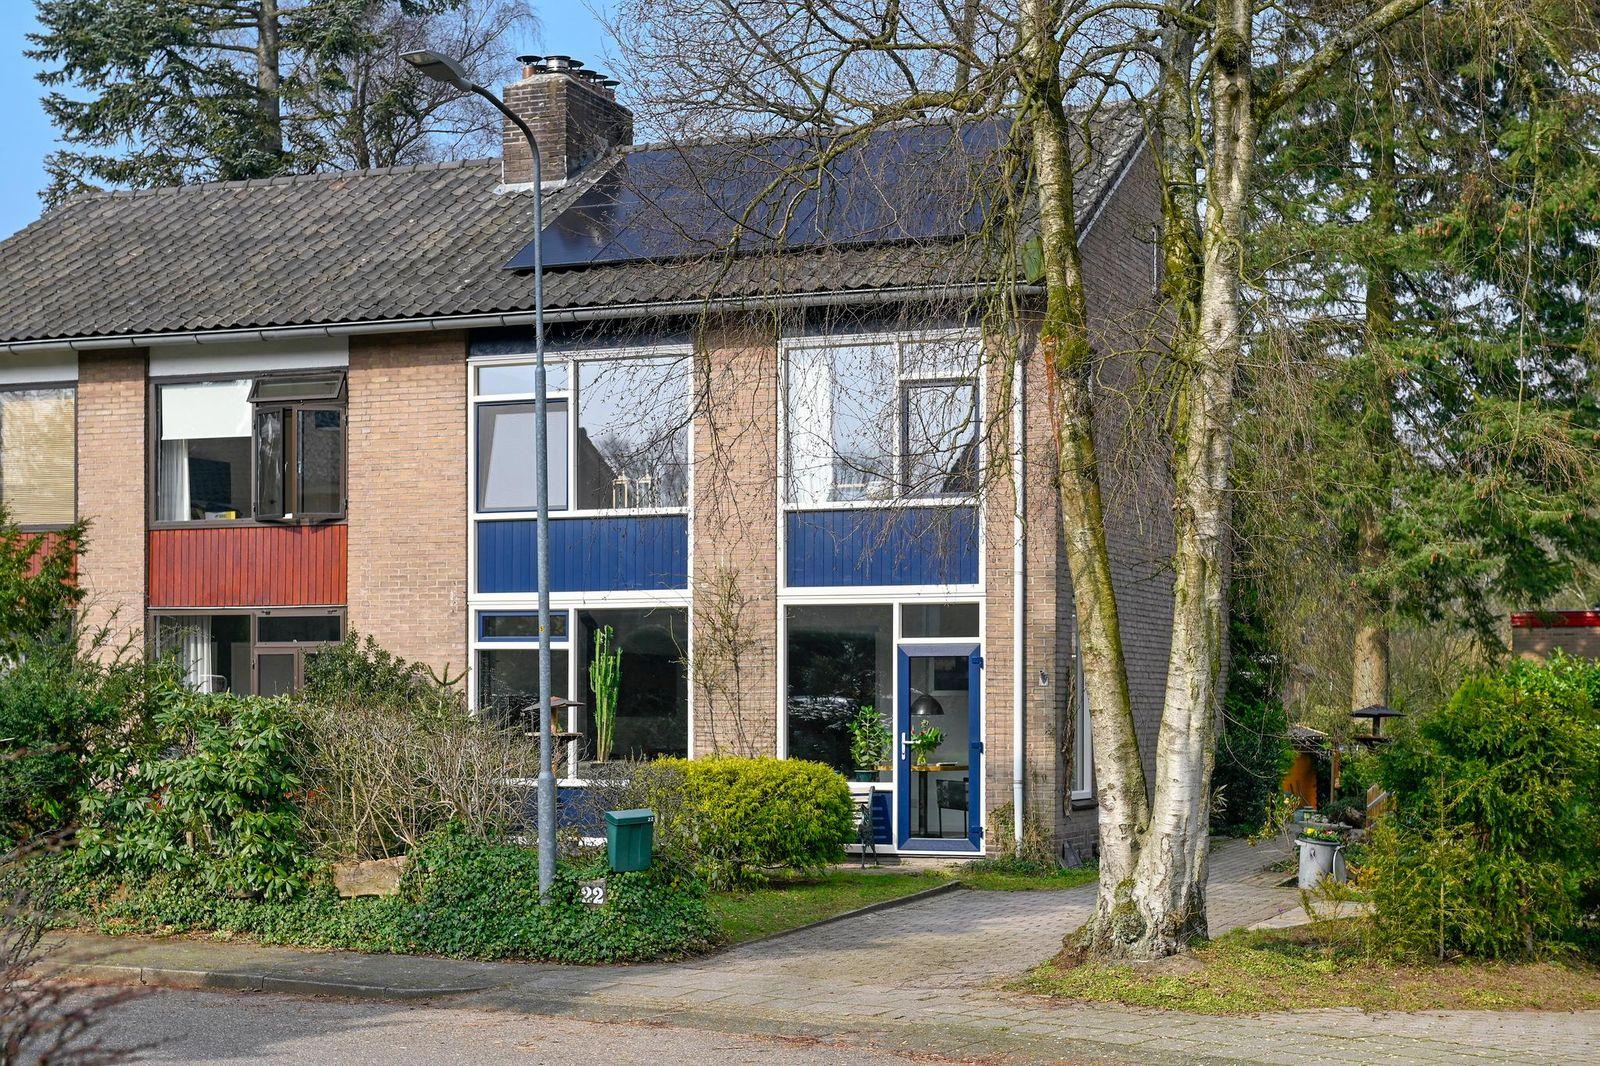 Secretaris Kuitstraat 22, Oosterbeek